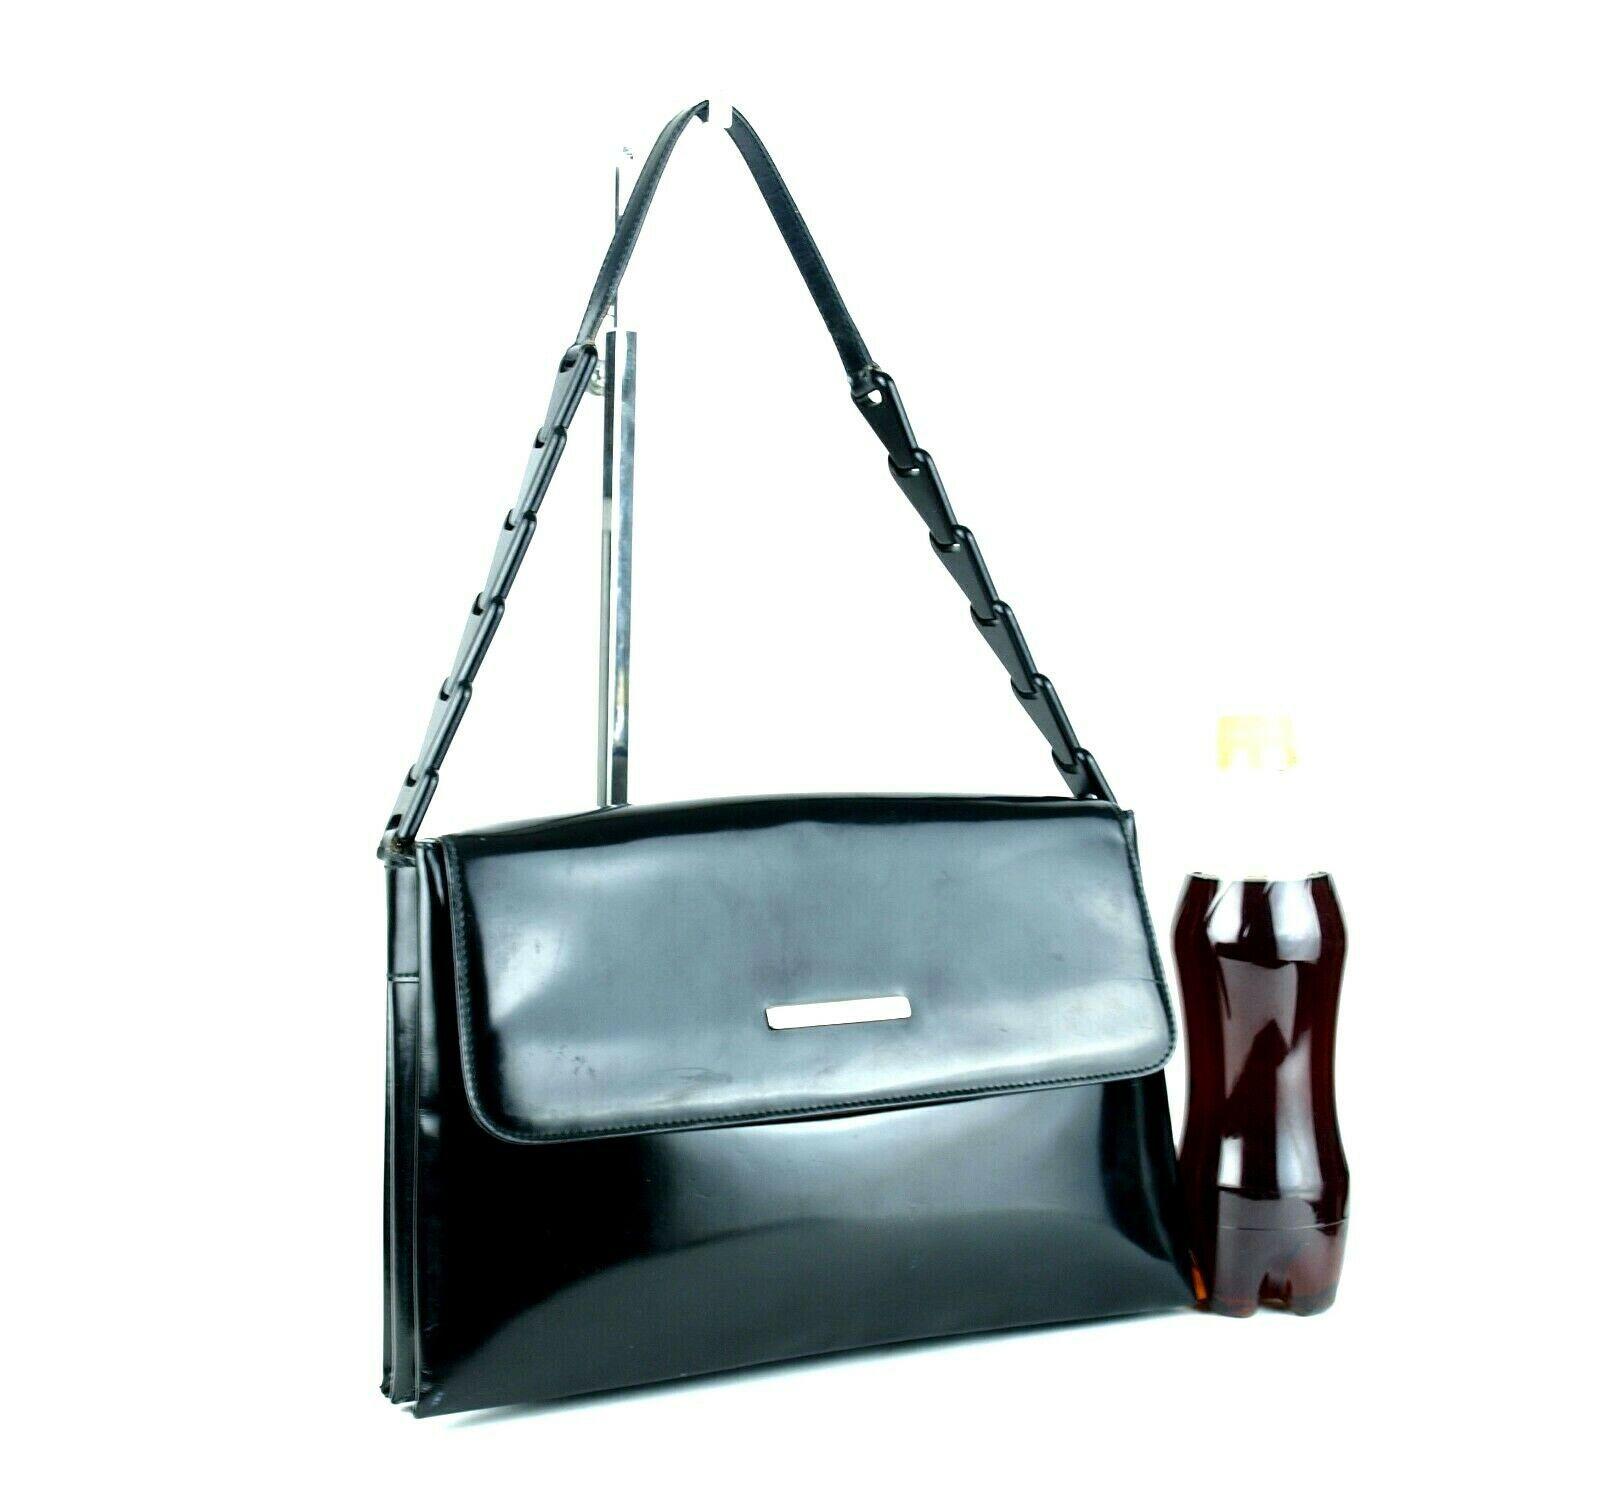 Authentic GUCCI Black Patent Leather & PVC Chain Semi Shoulder Bag Purse Italy